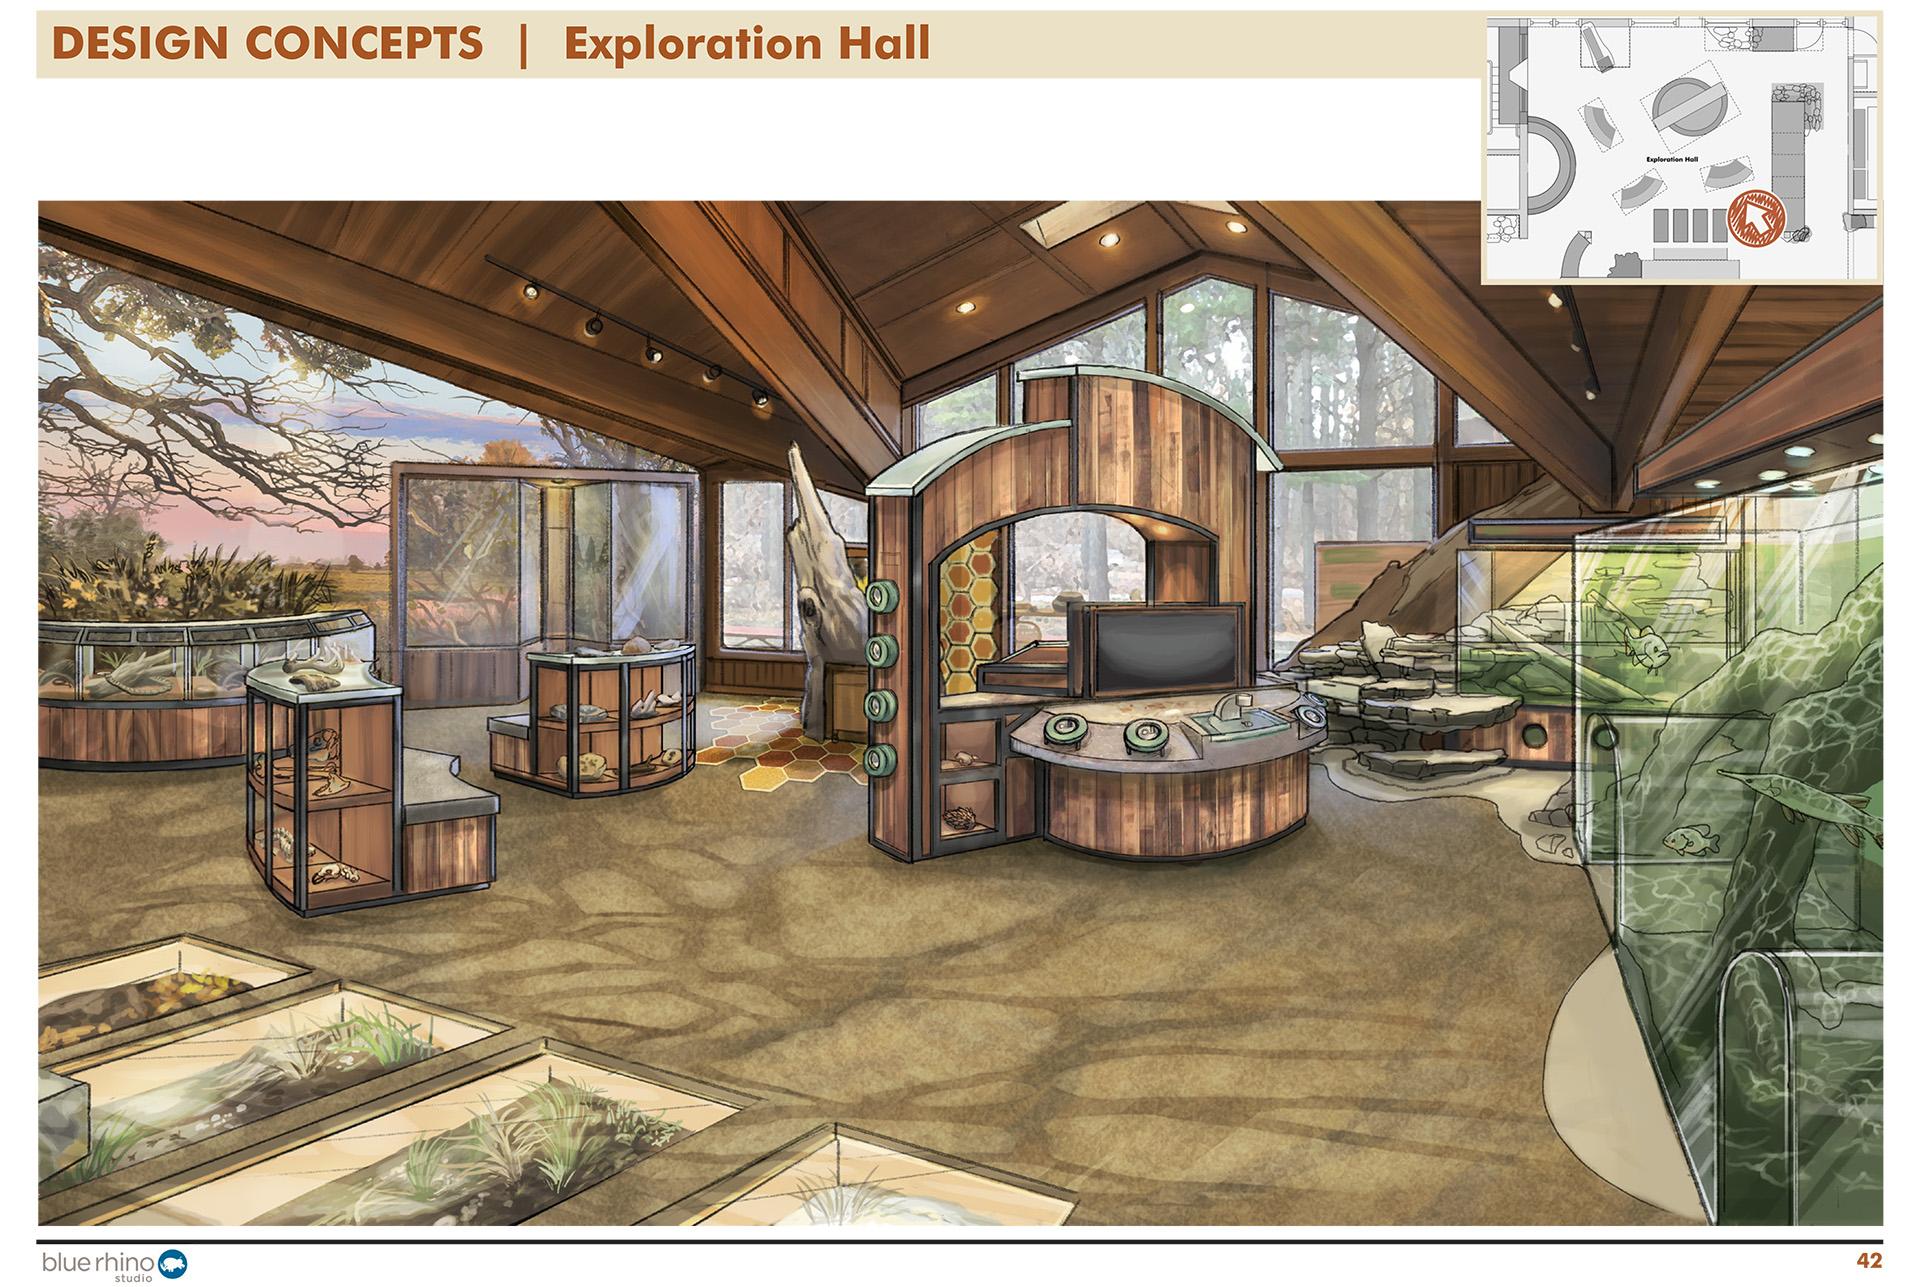 Exploration Hall, Window View 2